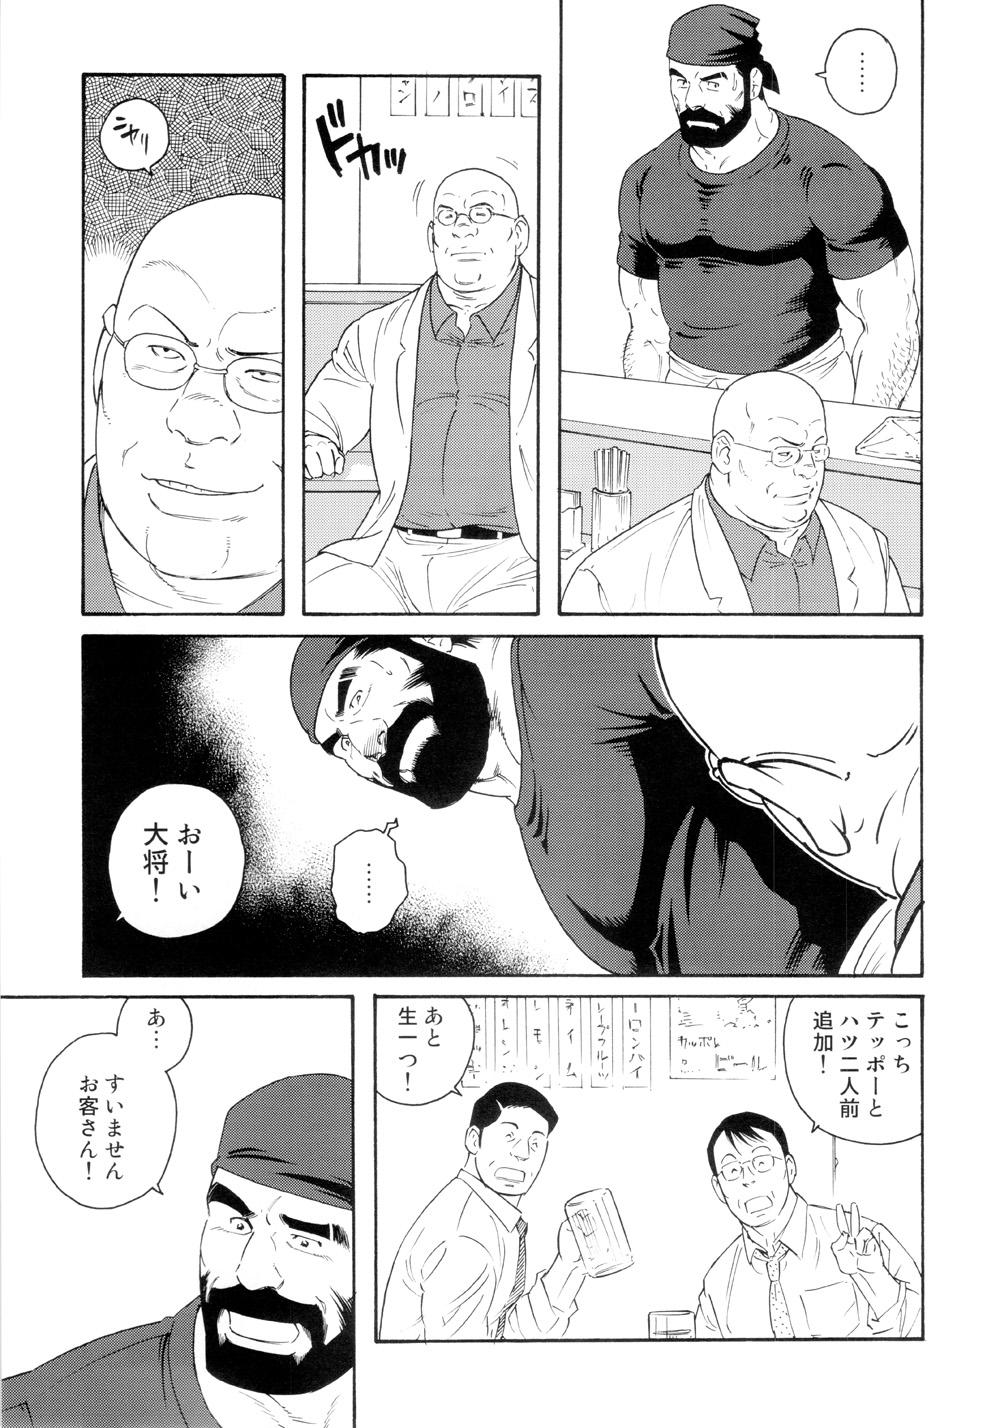 Genryu Chapter 1 2